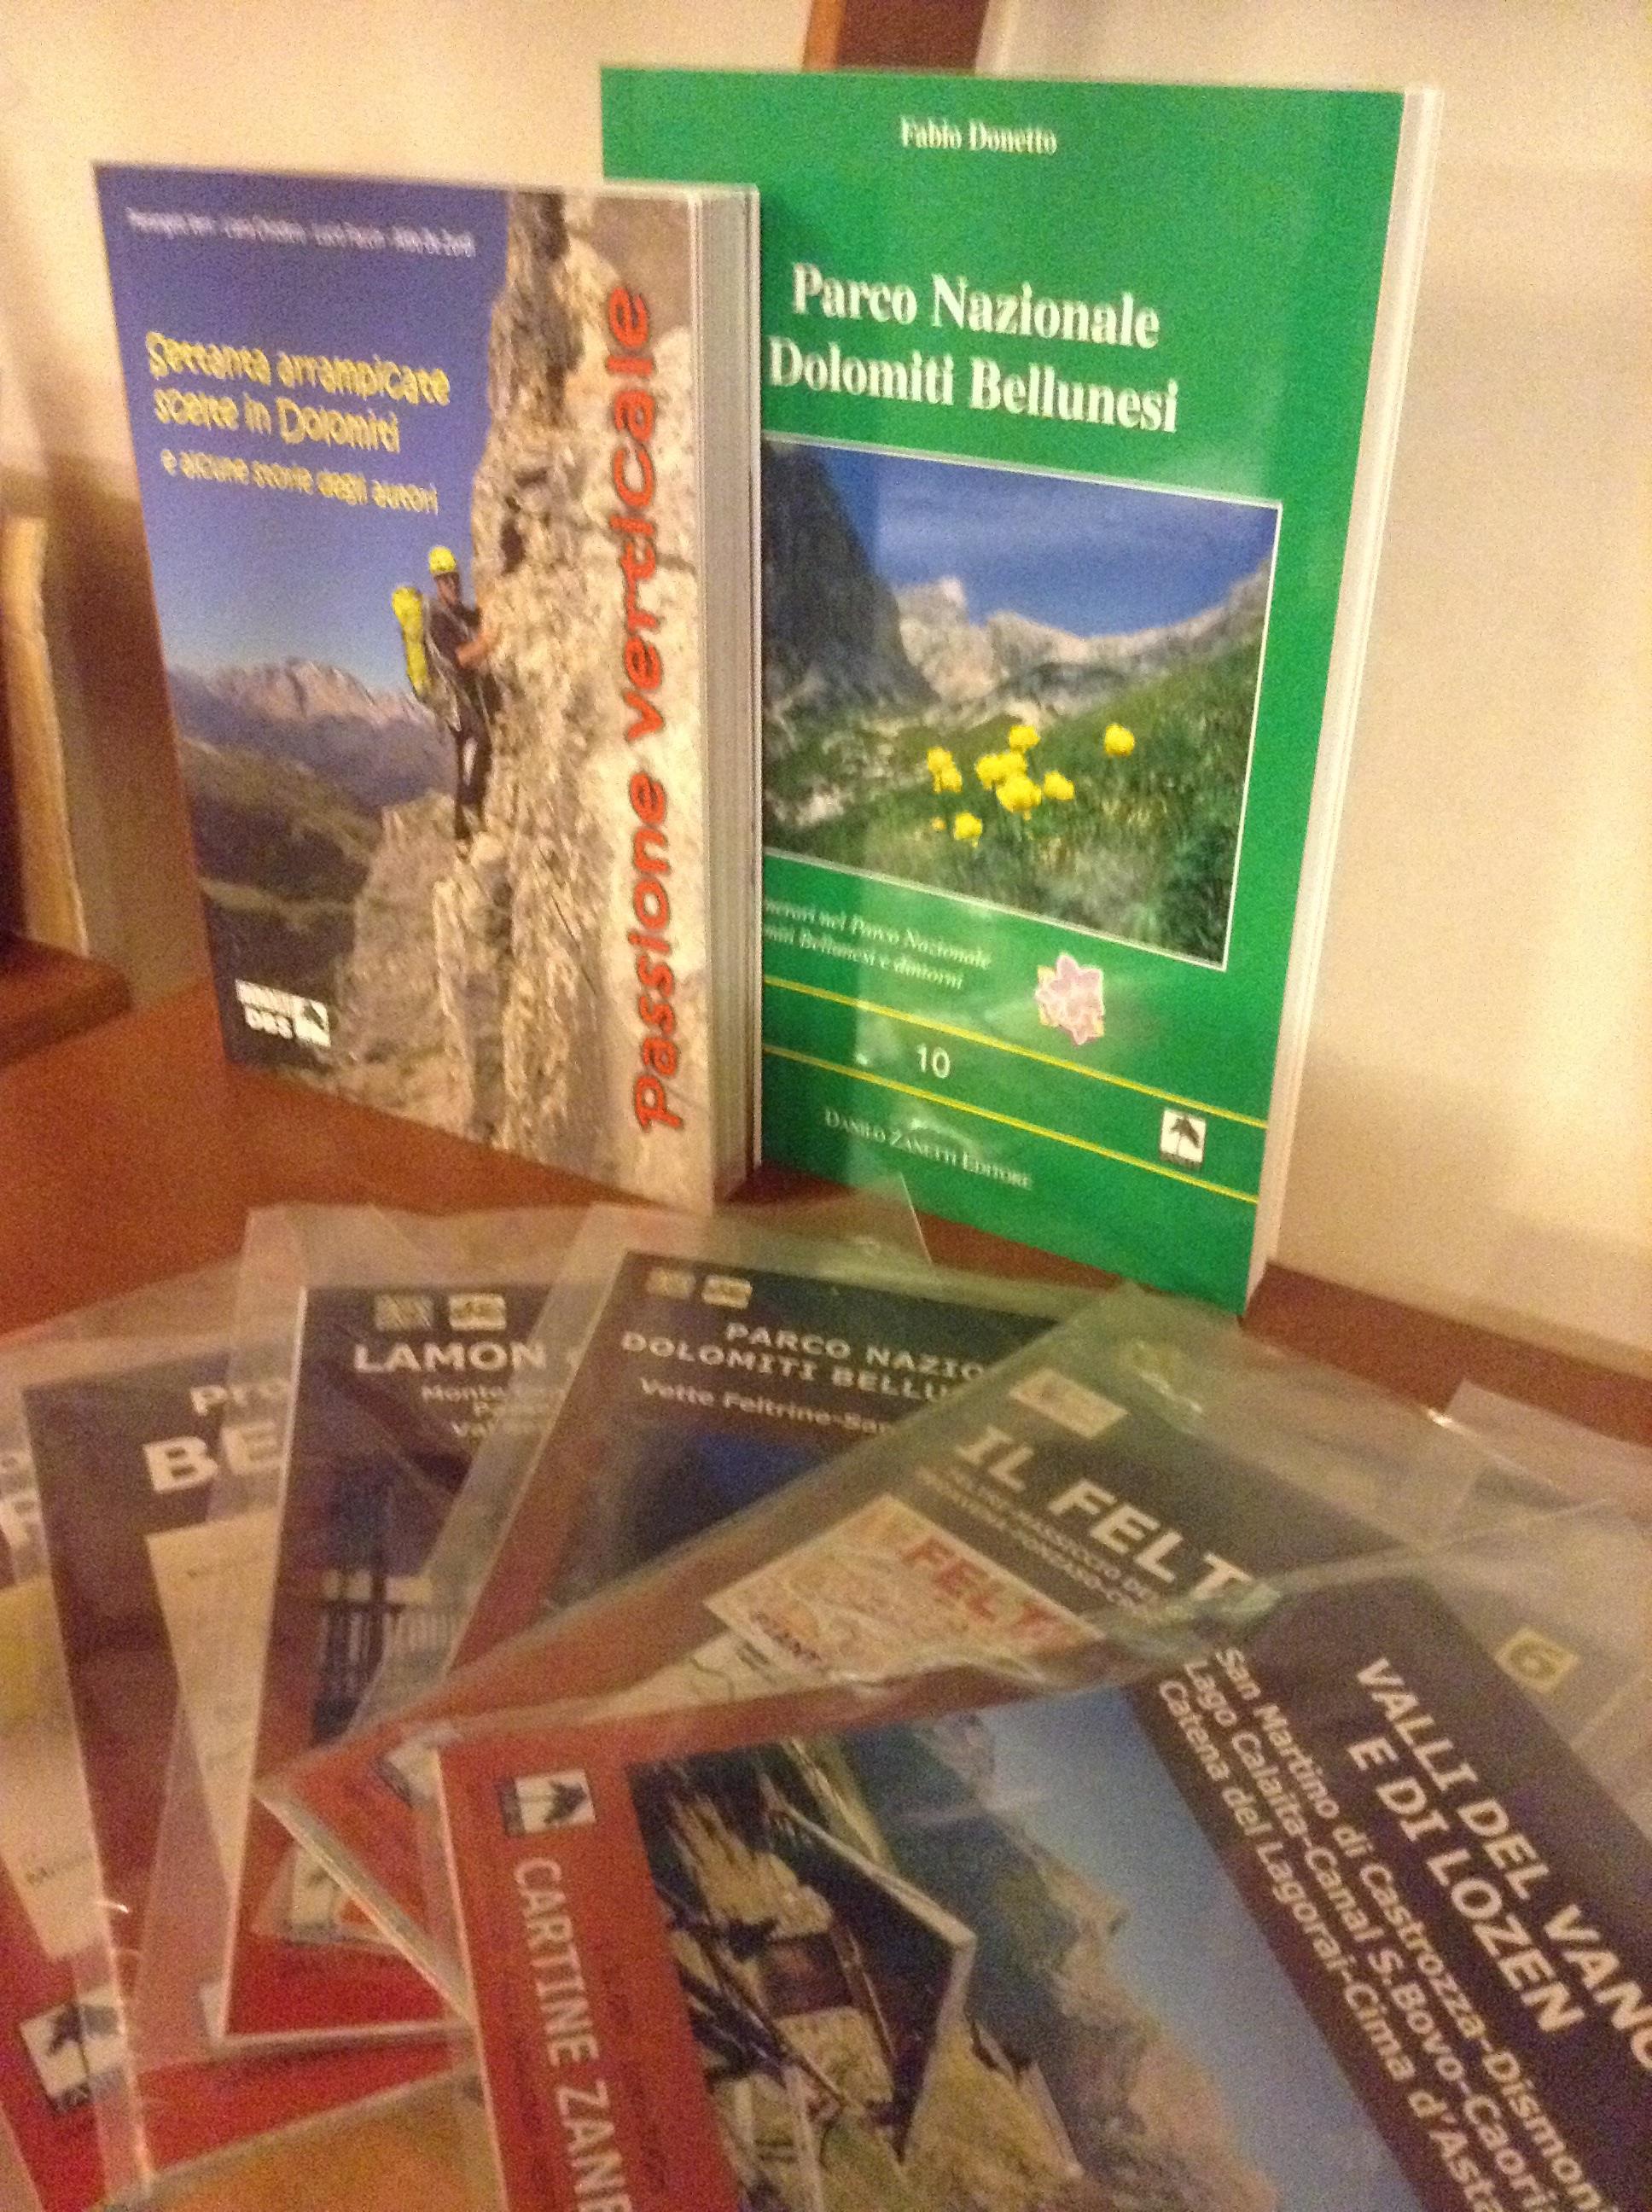 Novit libri in vendita all 39 antica torre for Libri vendita